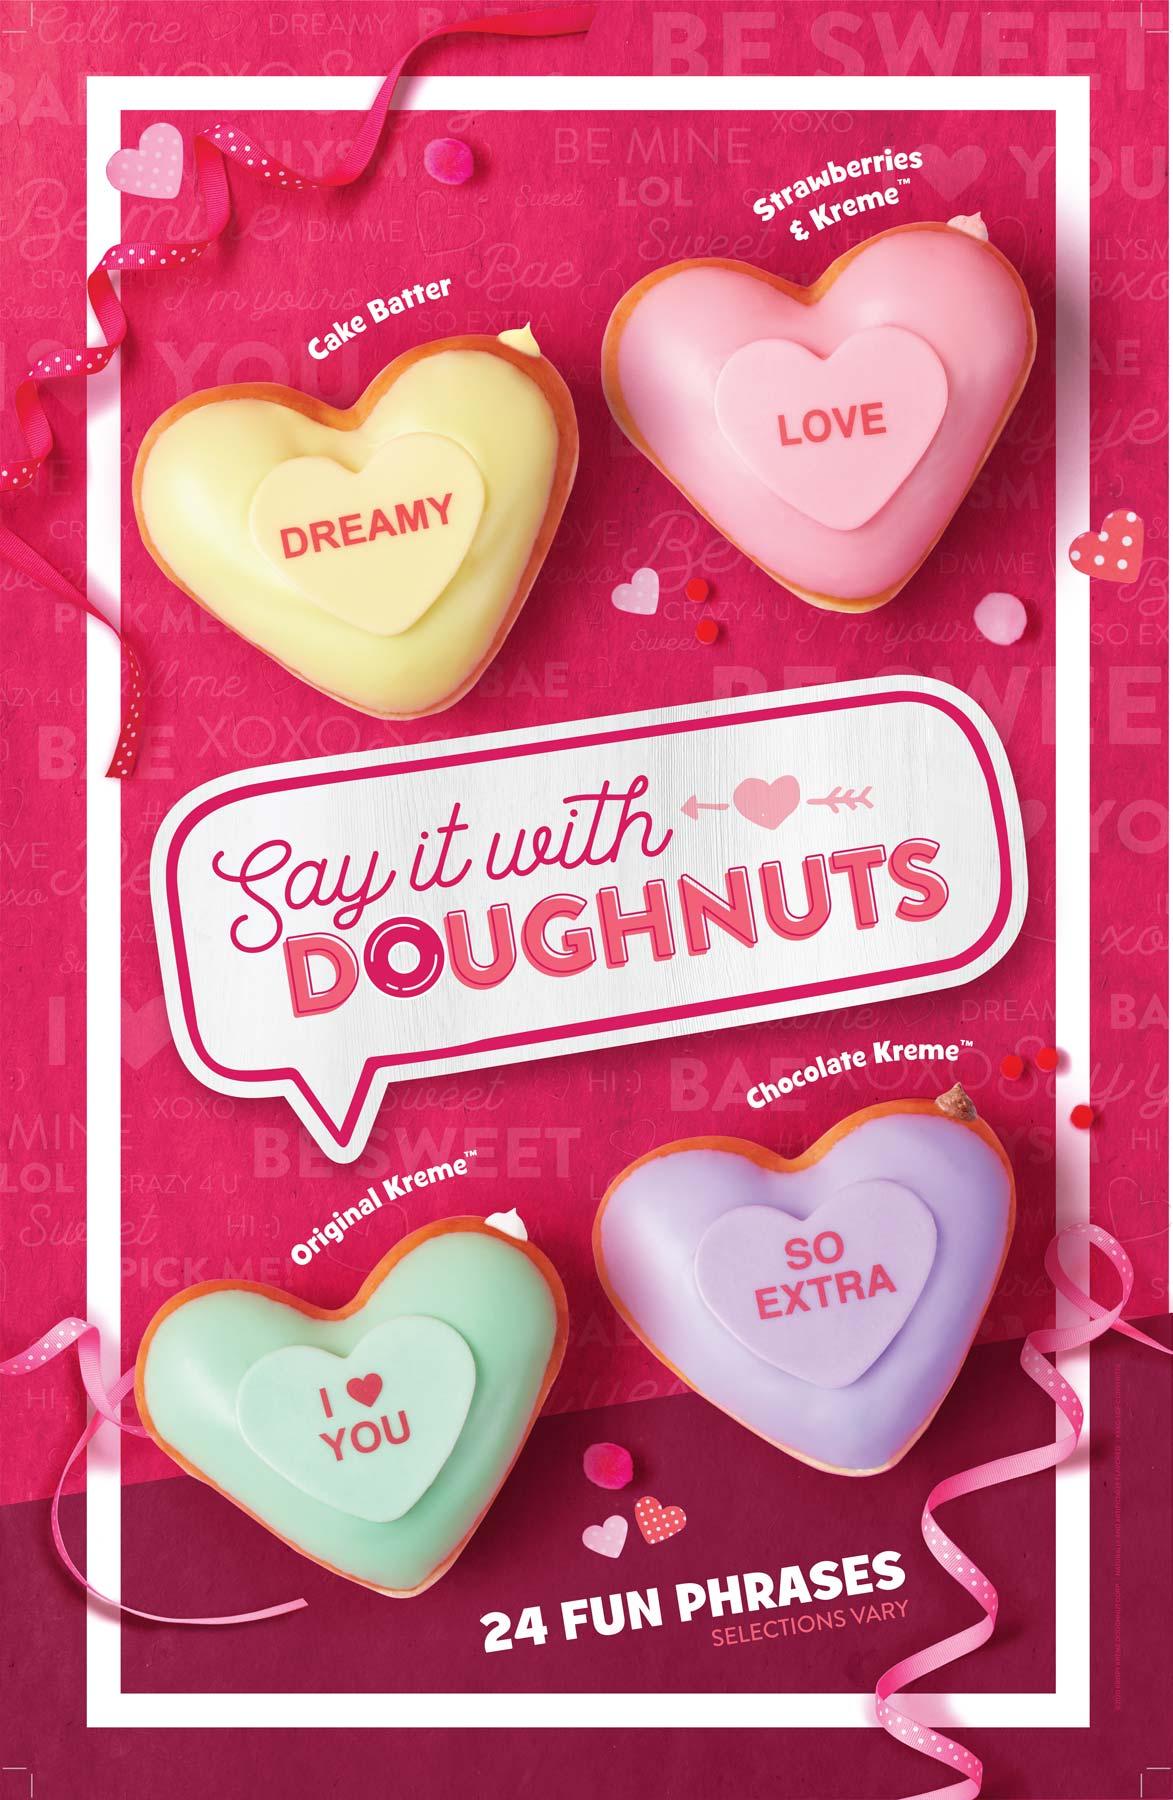 Krispy Kreme Doughnuts Valentines Day Tear Sheet by Salt Paper Studio of Charlotte, NC